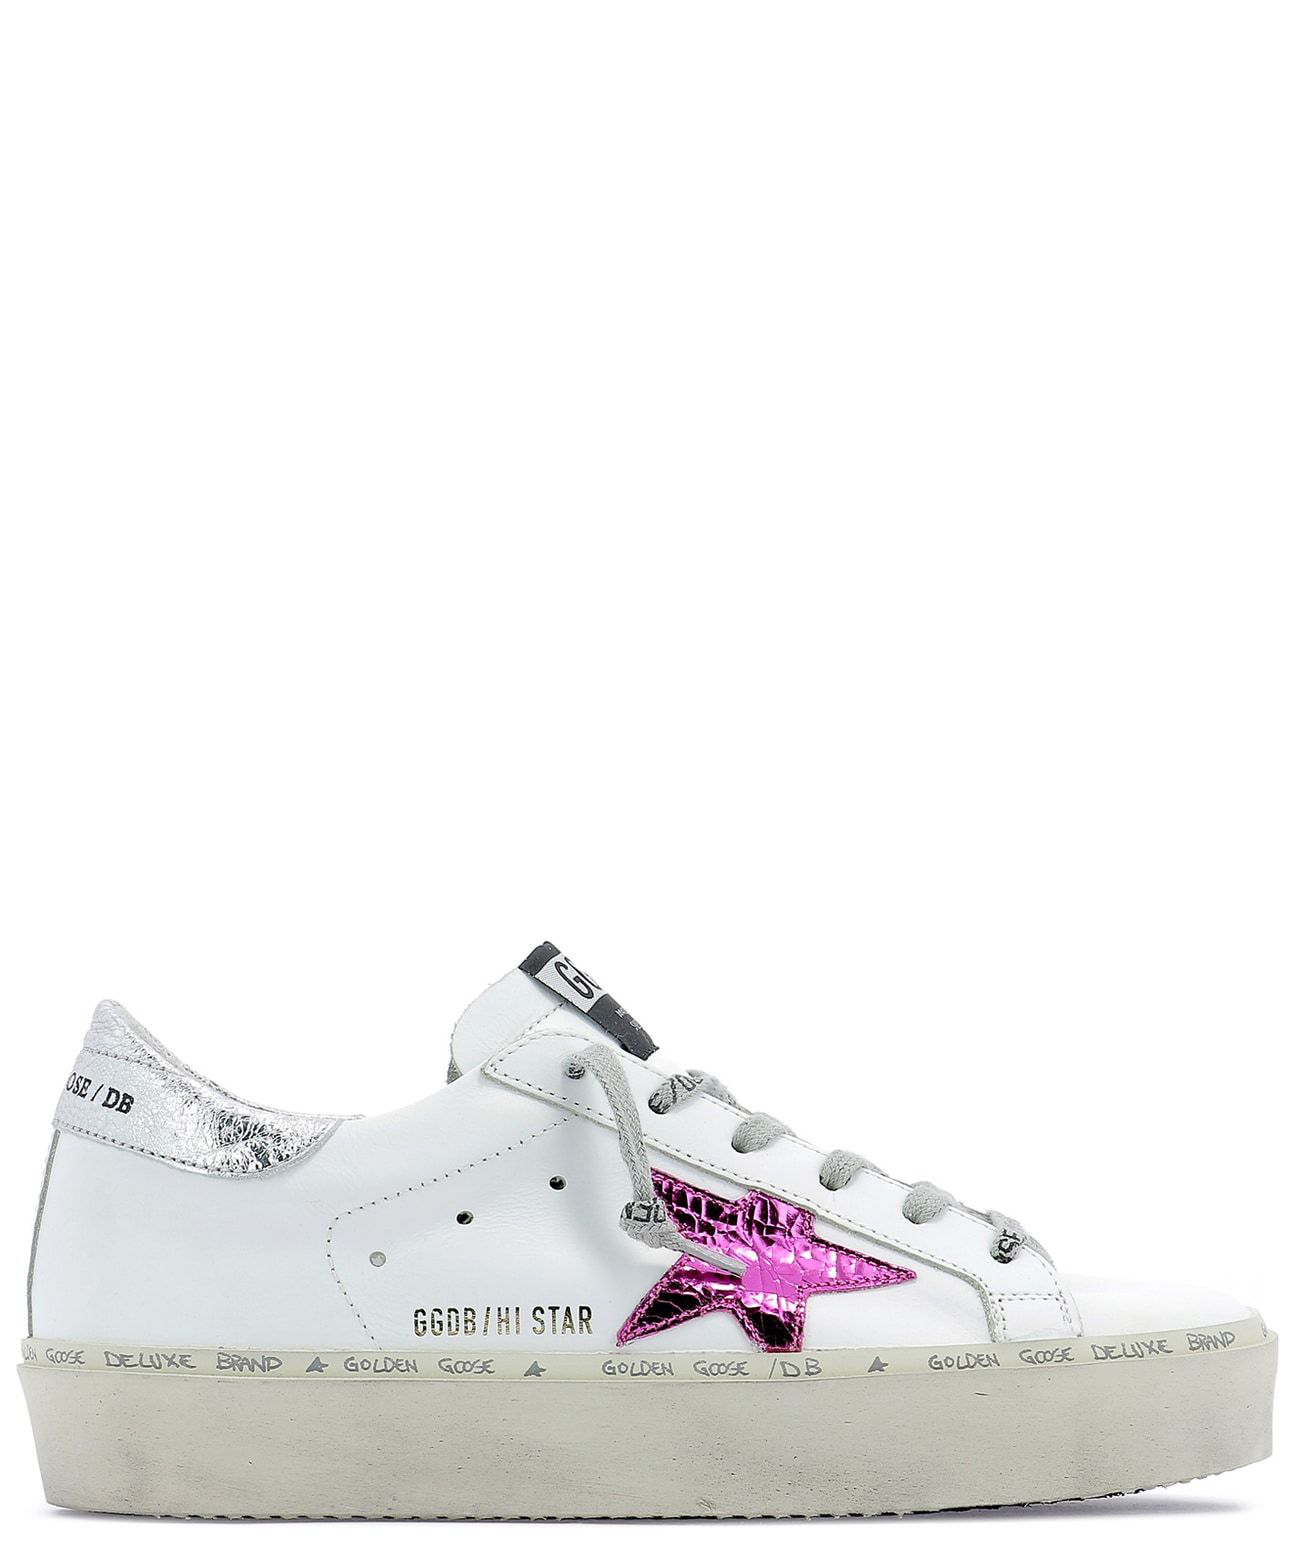 d8d4afff02d2 Golden Goose Deluxe Brand Hi Star Sneakers In White